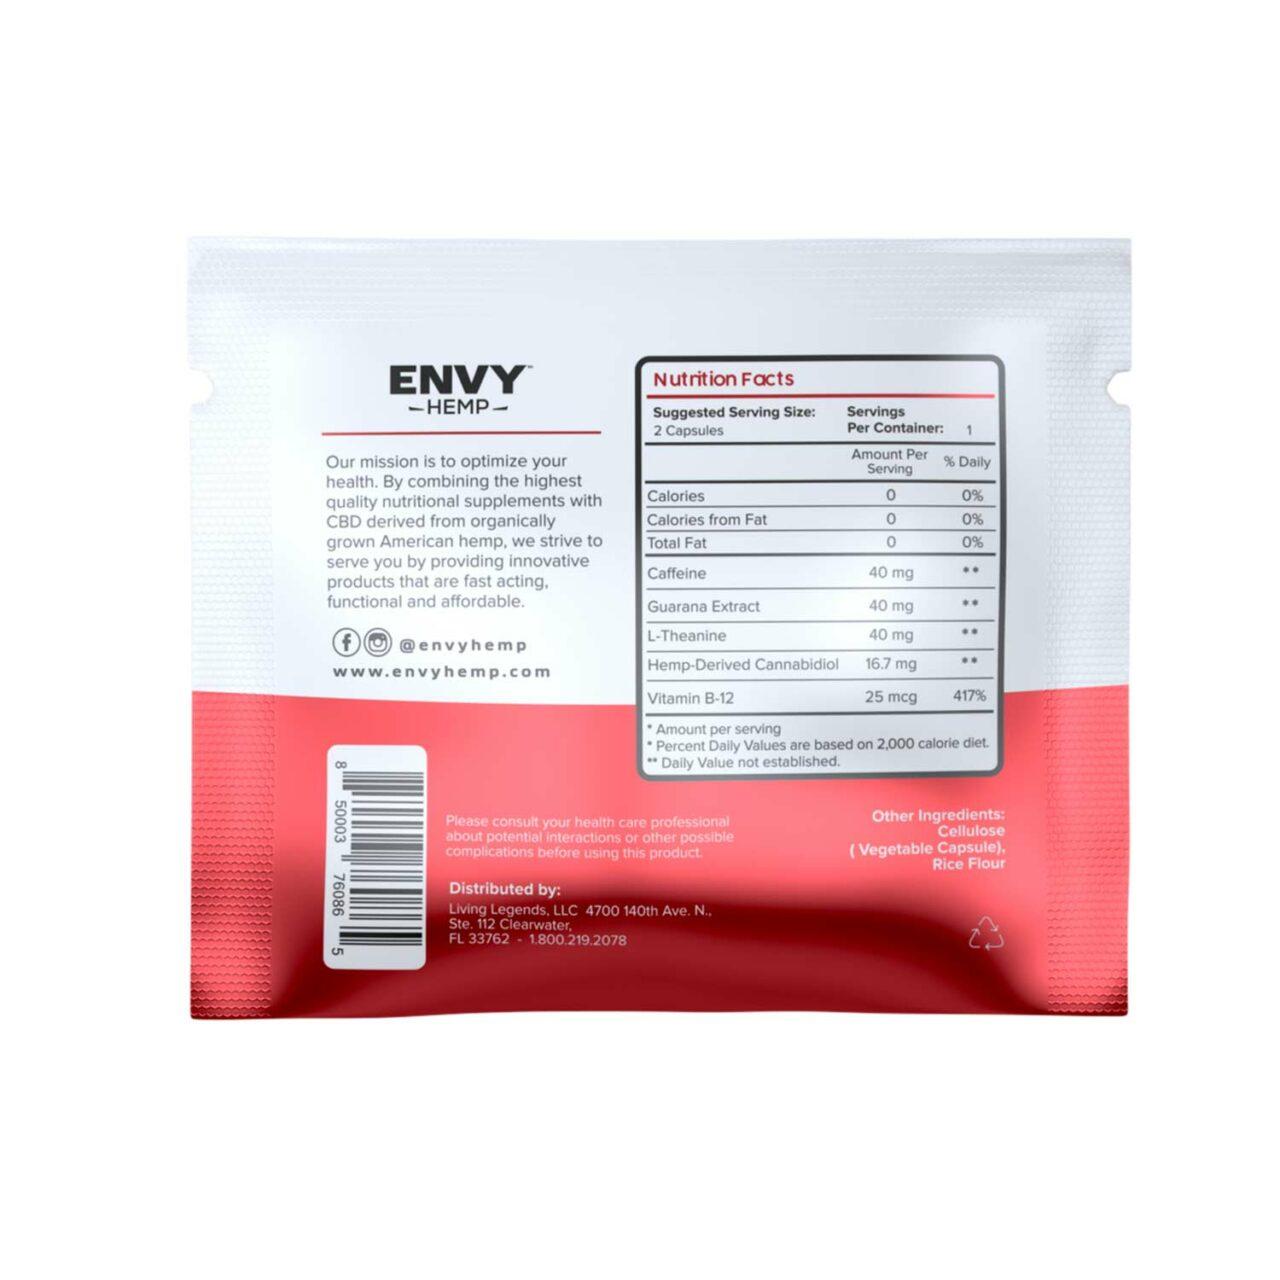 envy-hemp-cbd-capsules-for-energy-with-caffeine-30-count-16-7mg-of-cbd-back